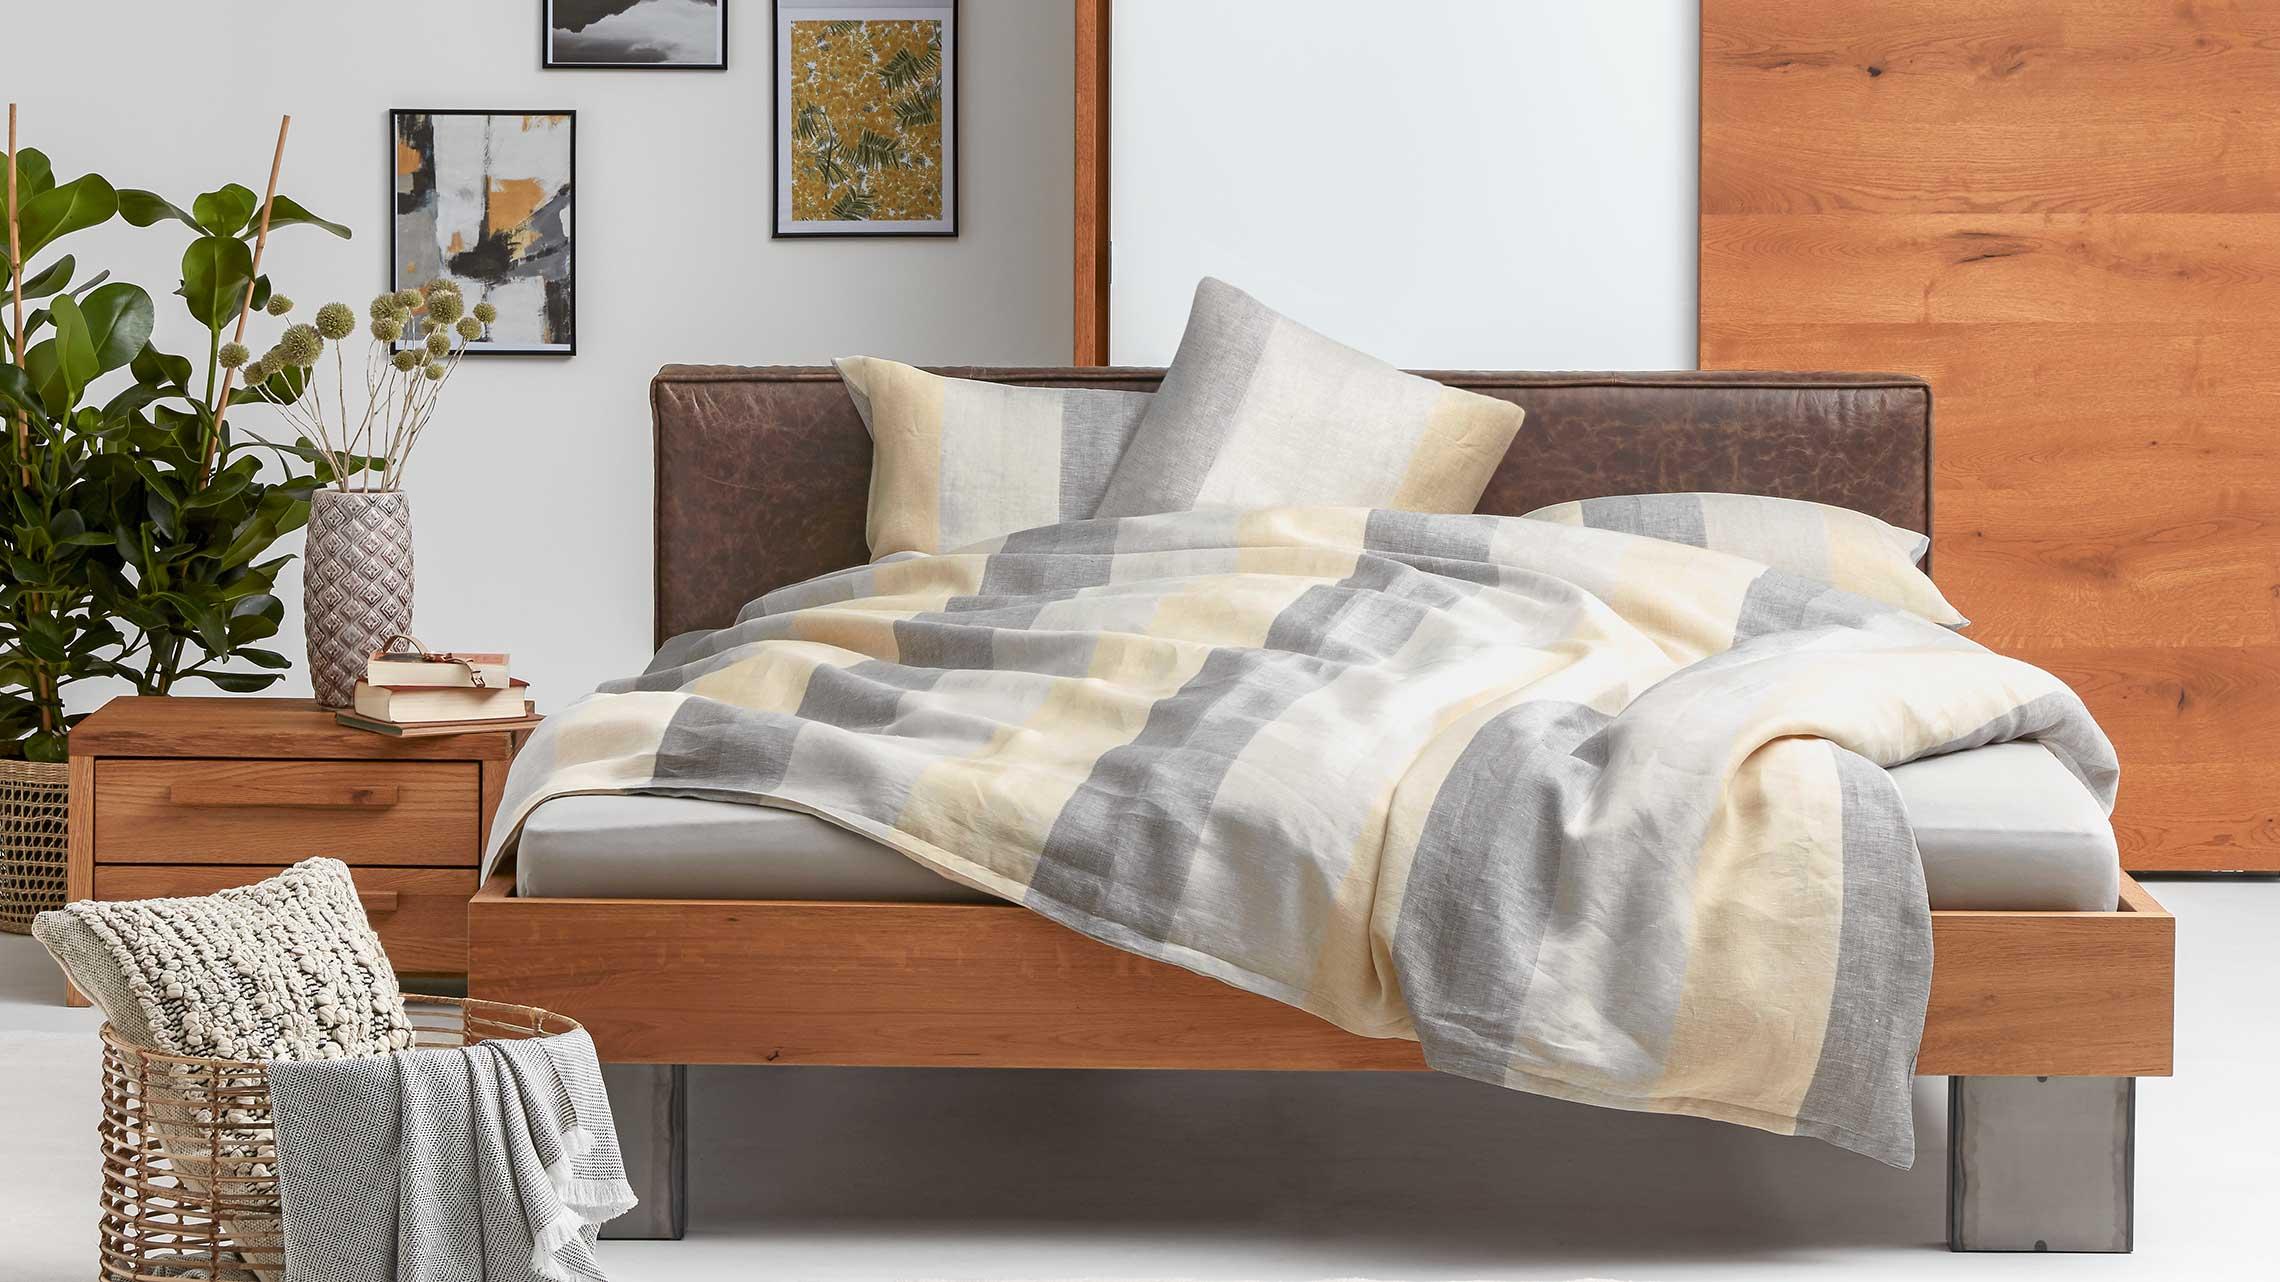 Teppich Vorm Bett Anzeige Make Your Bed The Cosiest Place